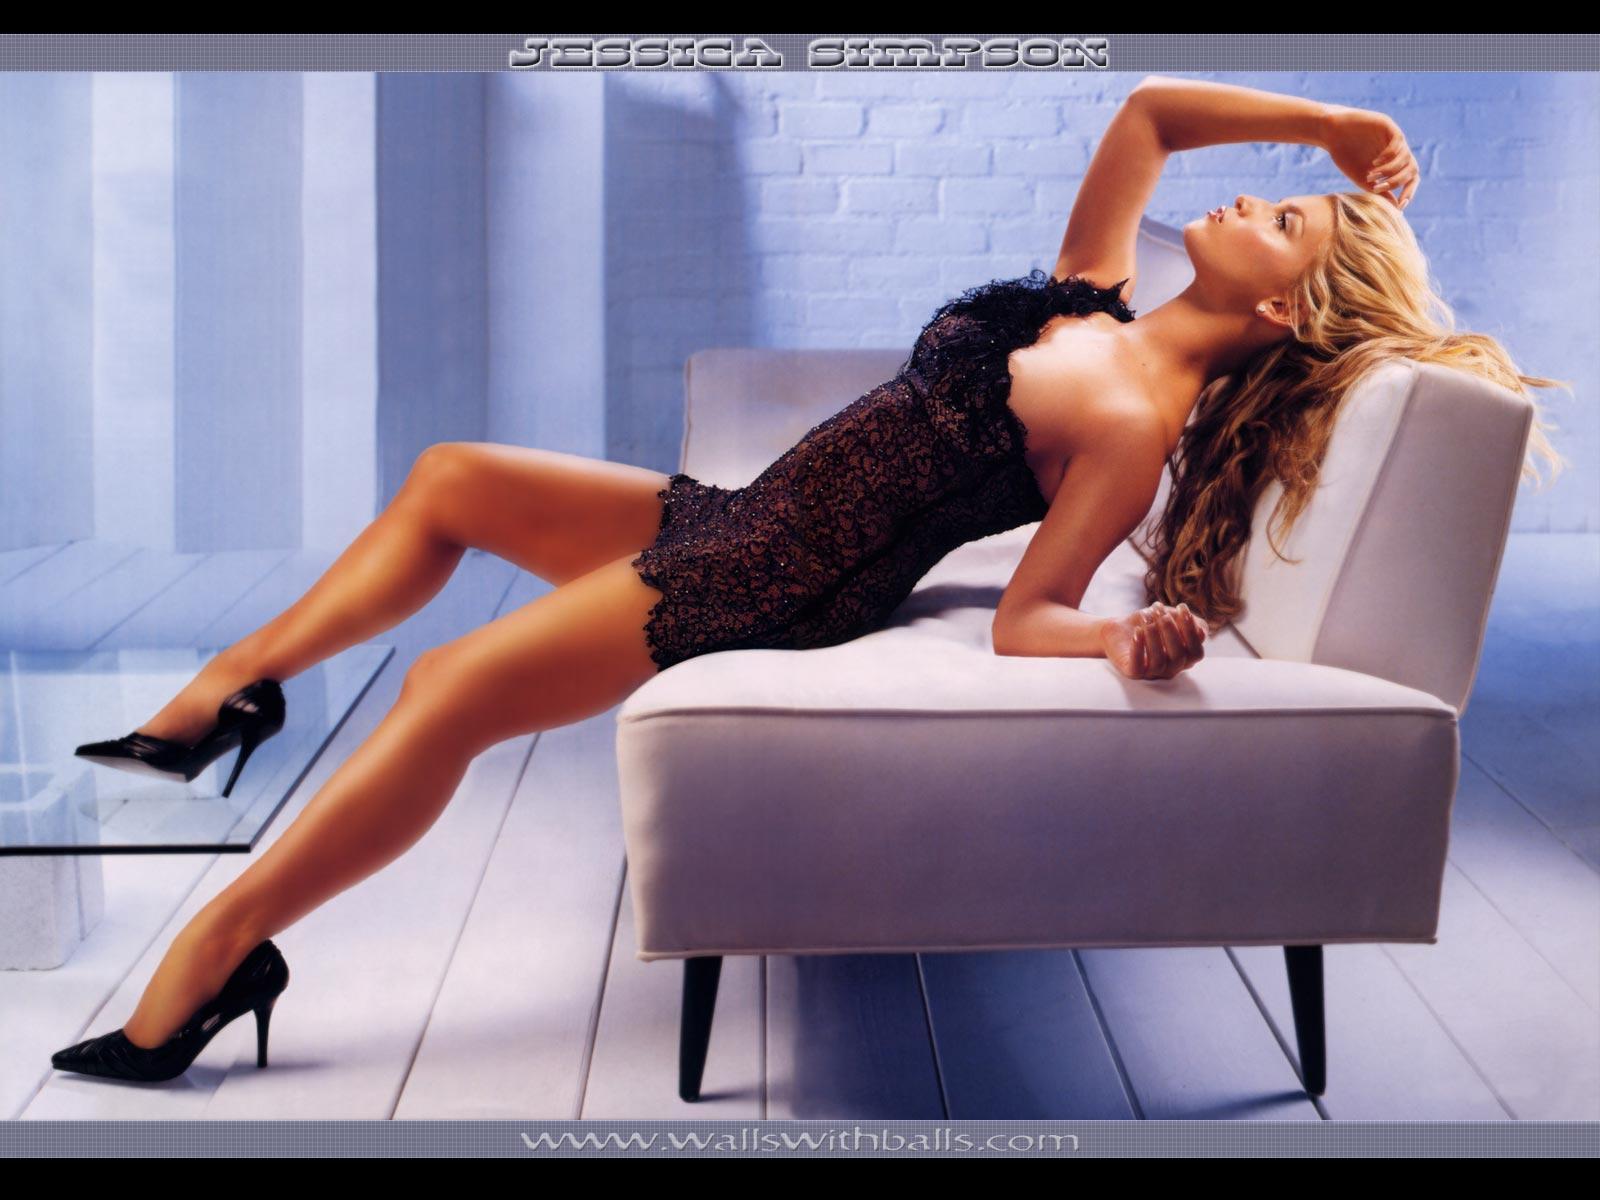 Wallpaper canape Christina Aguilera